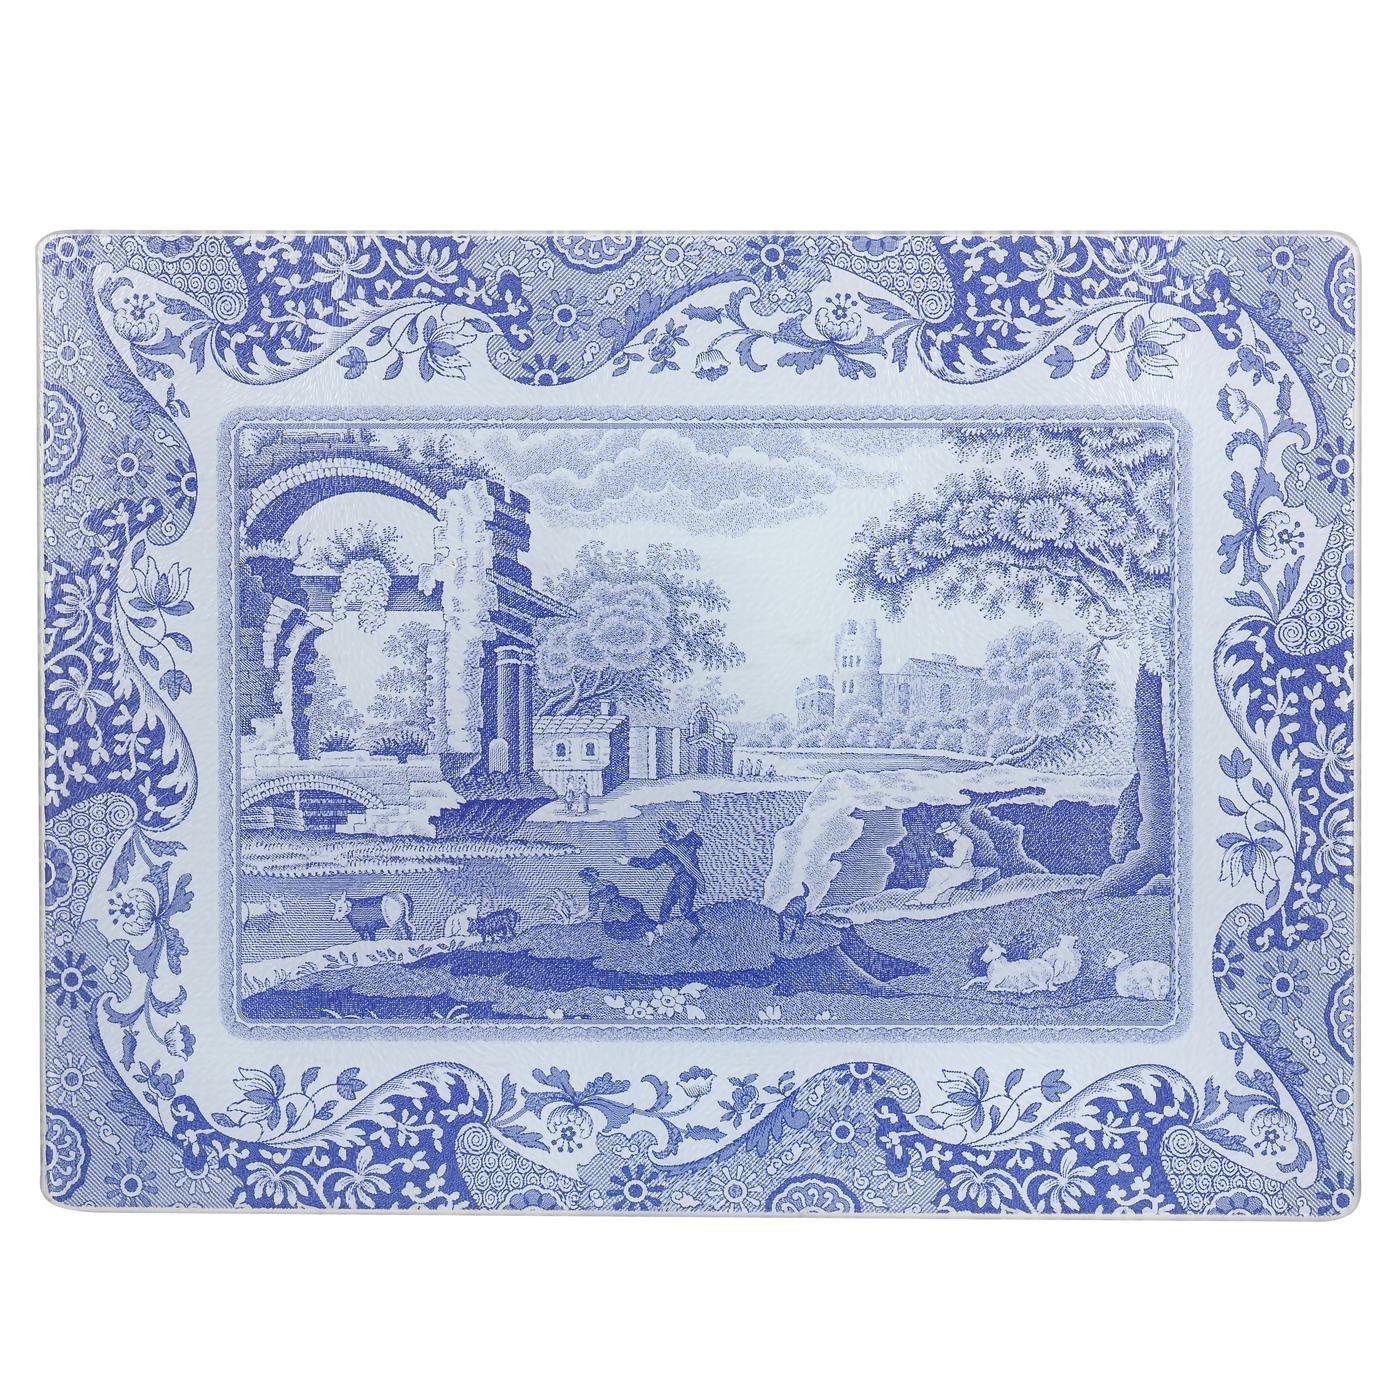 Blue Italian 30 x 40 cm Glass Glass Worktop Saver, Blue/White Spode X0019118337